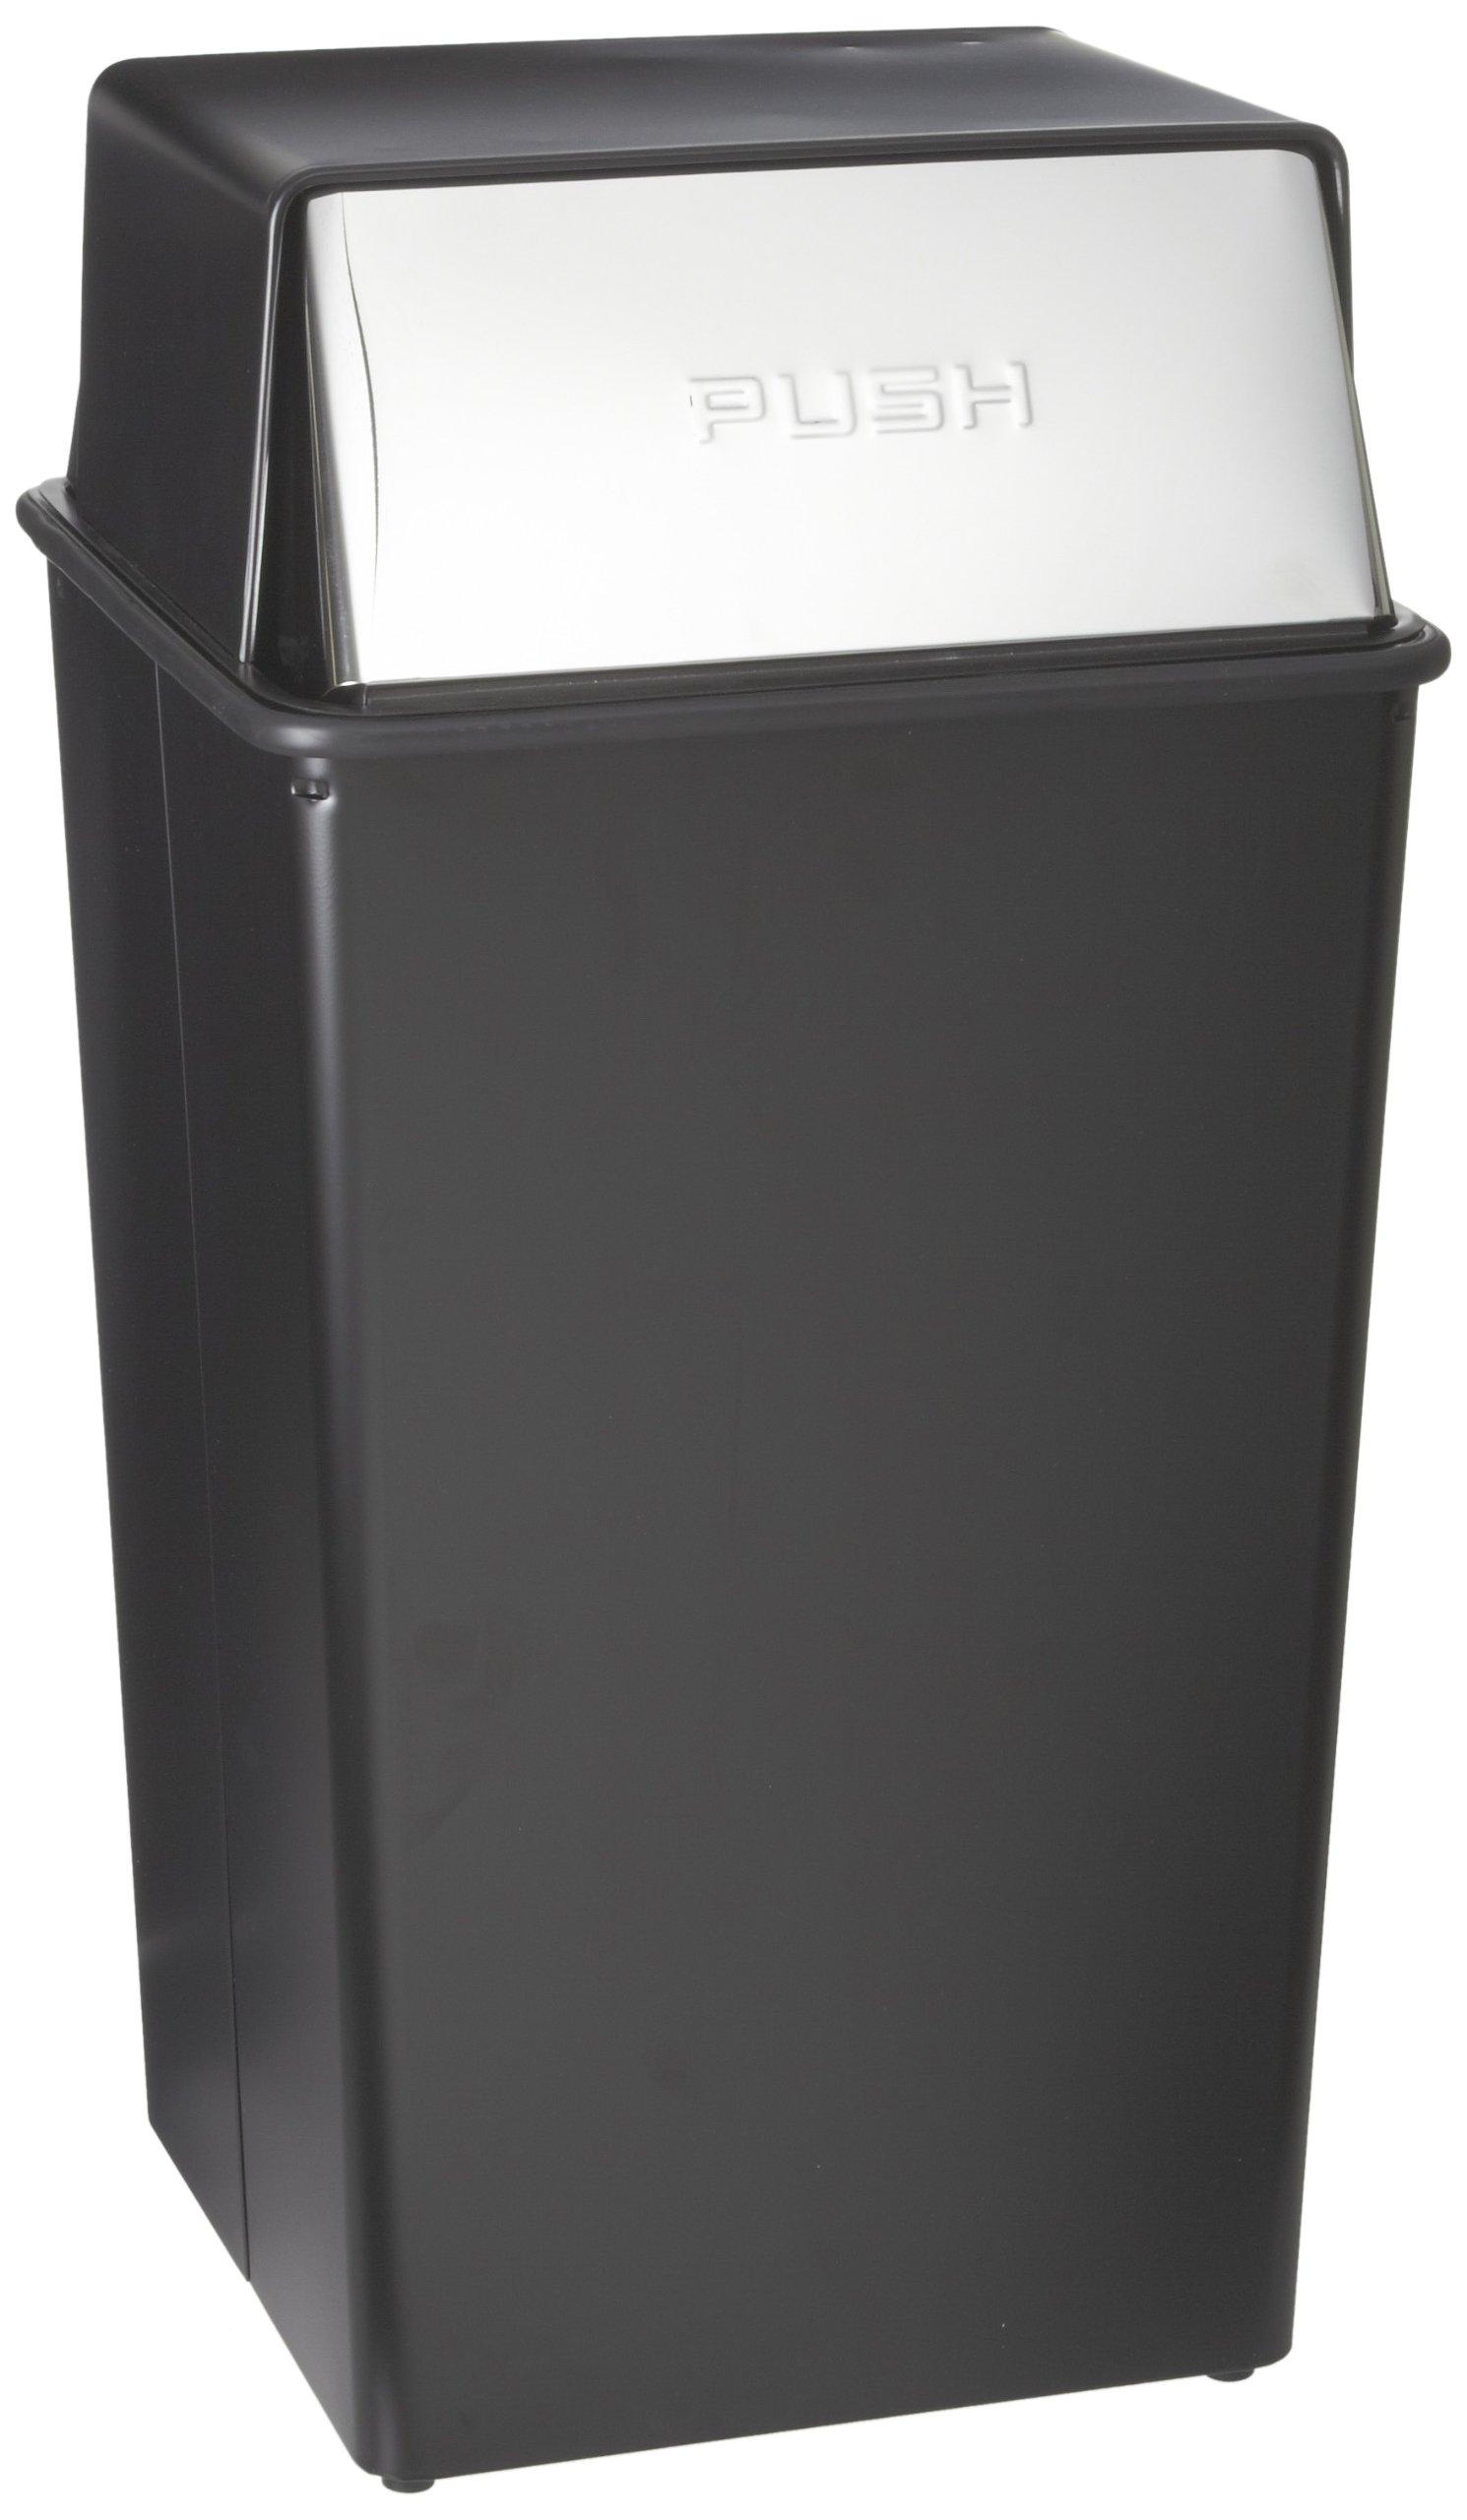 Witt Industries 36HT-22 Steel 36-Gallon Monarch Series Hamper and Push Top Receptacle, Legend ''Push'', Square, 19'' Width x 19'' Depth x 37'' Height, Black